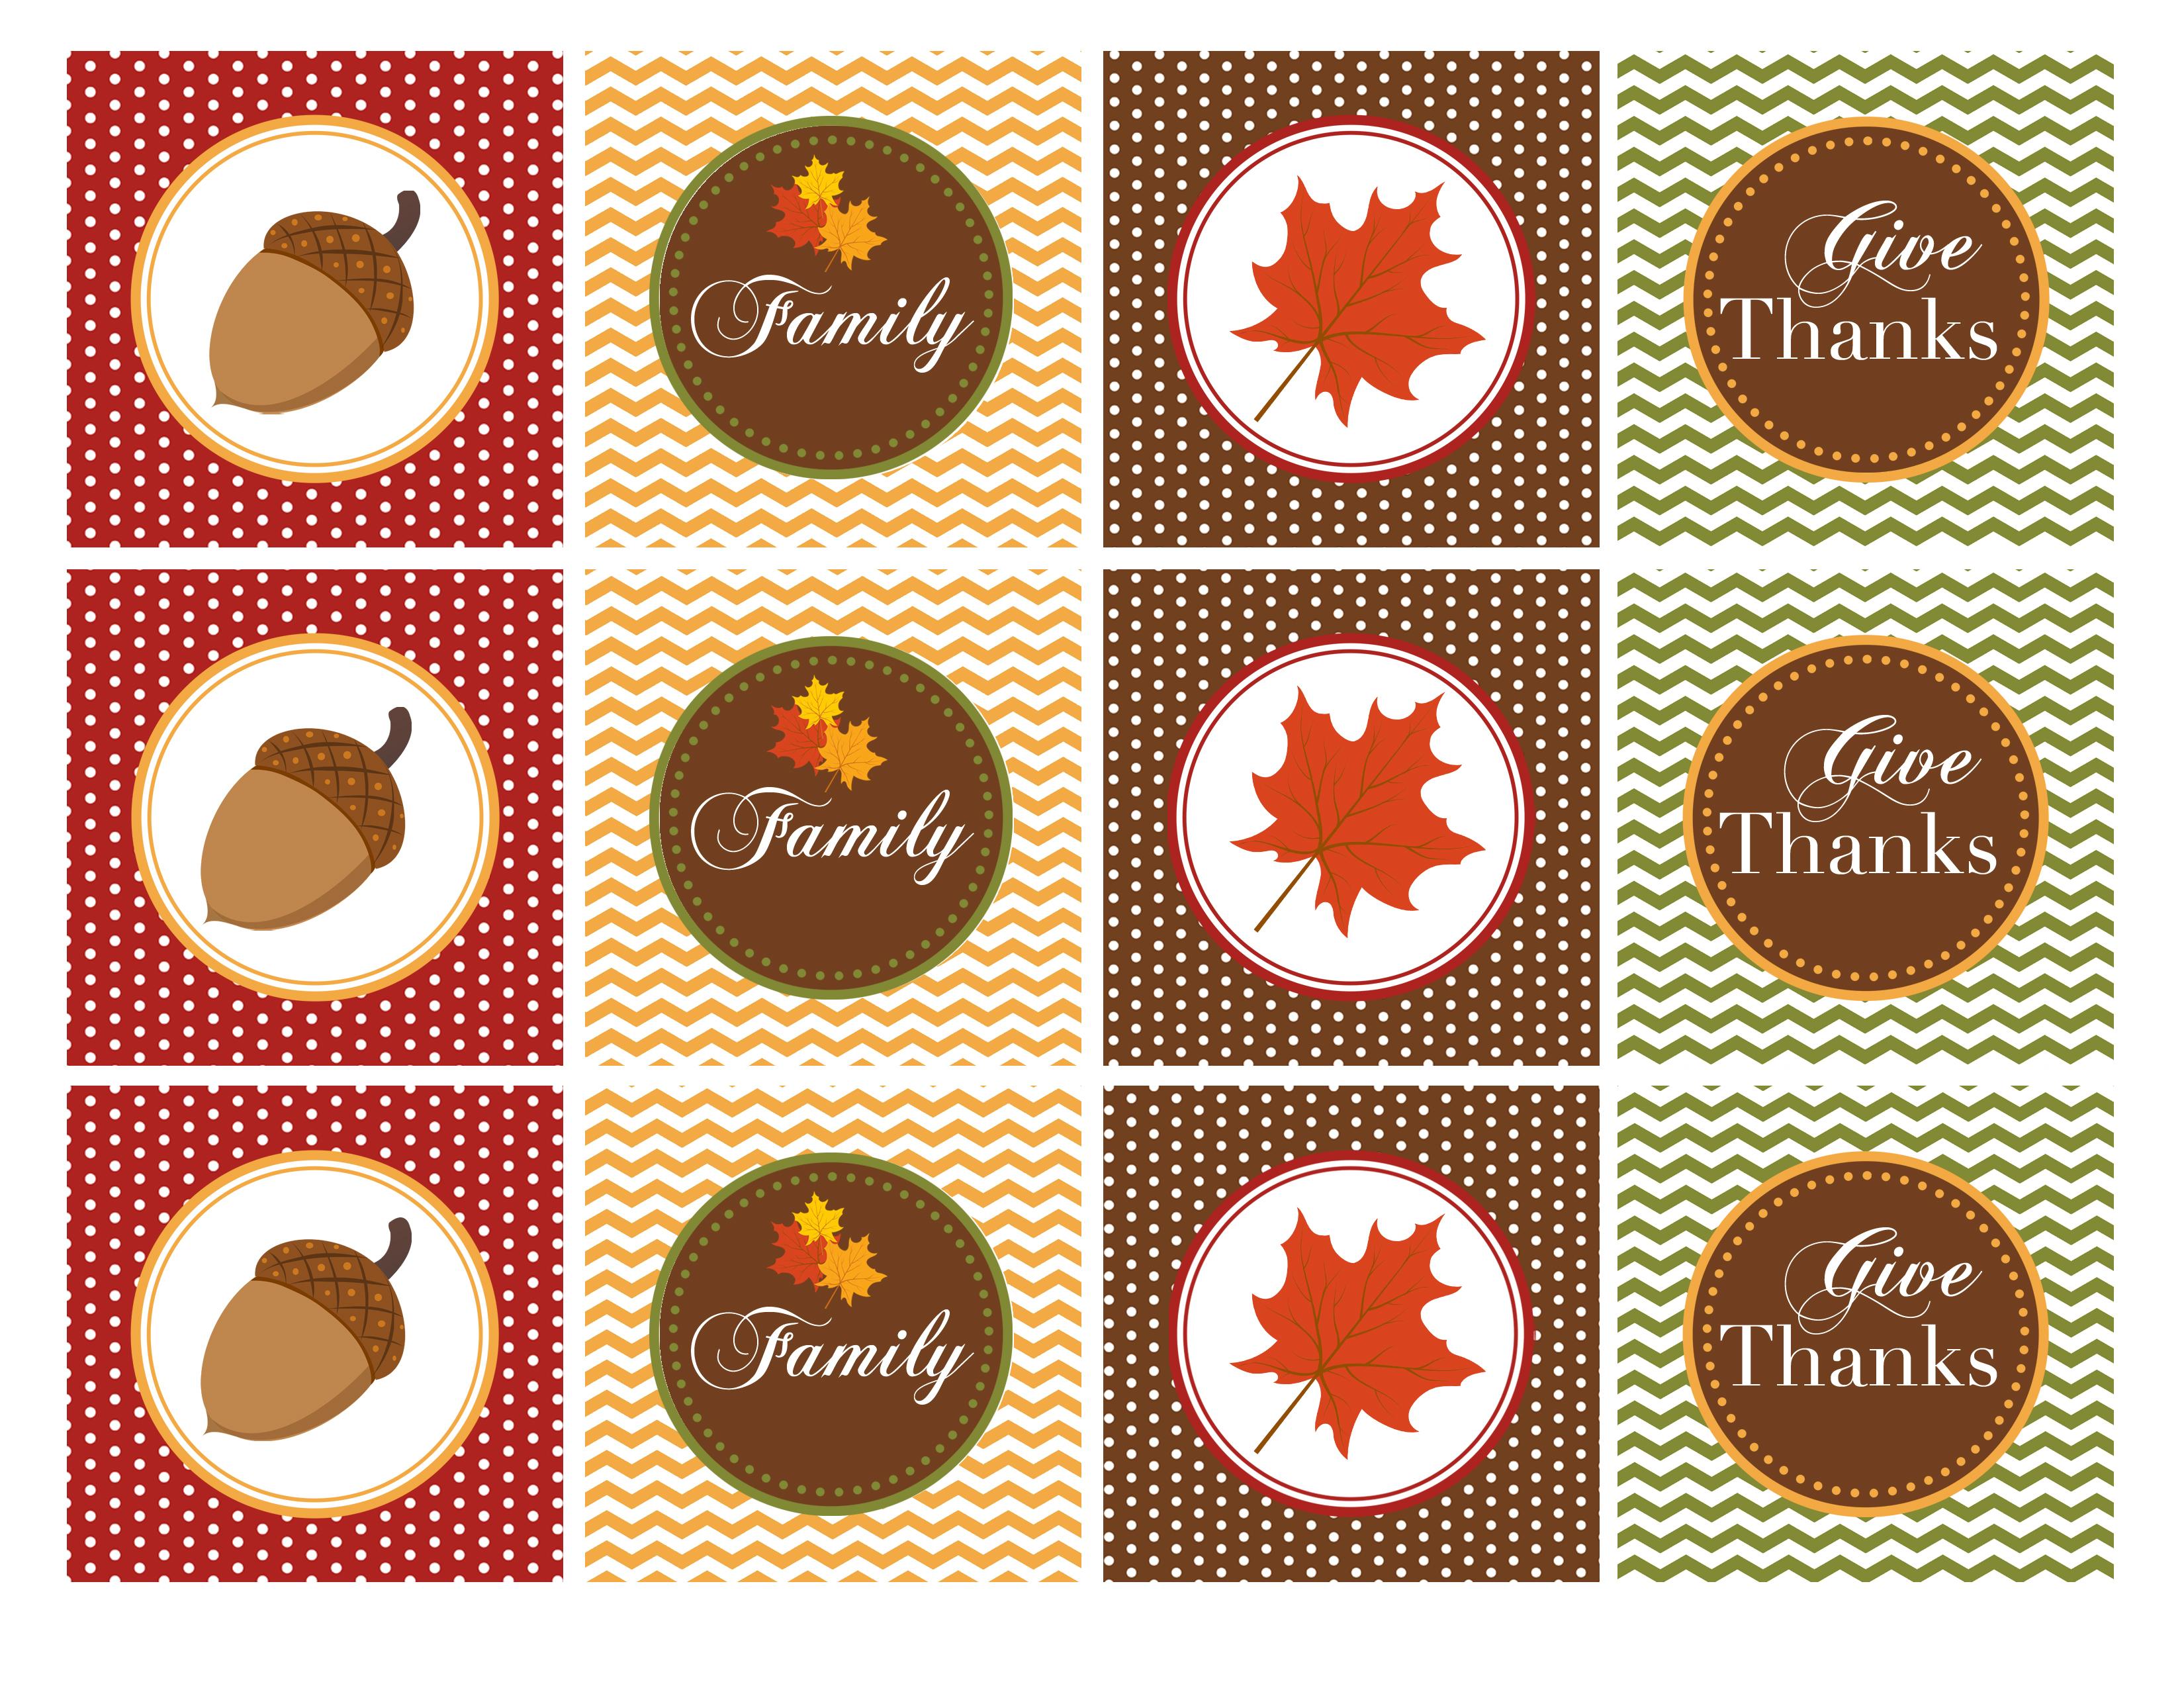 Free Printable Thanksgiving Cupcake Toppers – Happy Easter - Thanksgiving Cupcake Toppers Printable Free